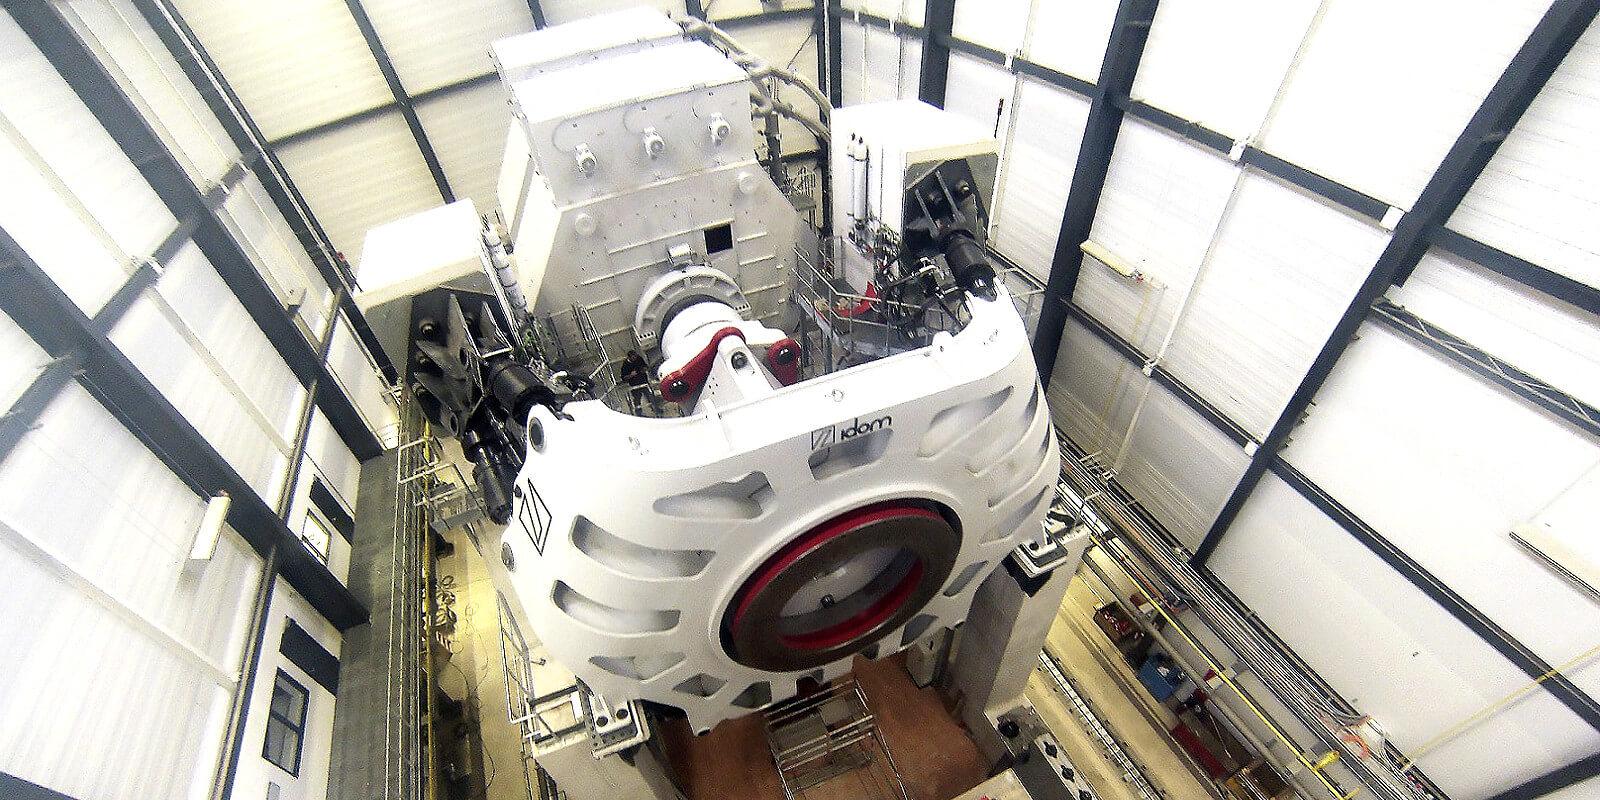 DyNaLab_Nacelle_Testing_Laboratory_Fraunhofer_IWES_Germany_Idom__1_